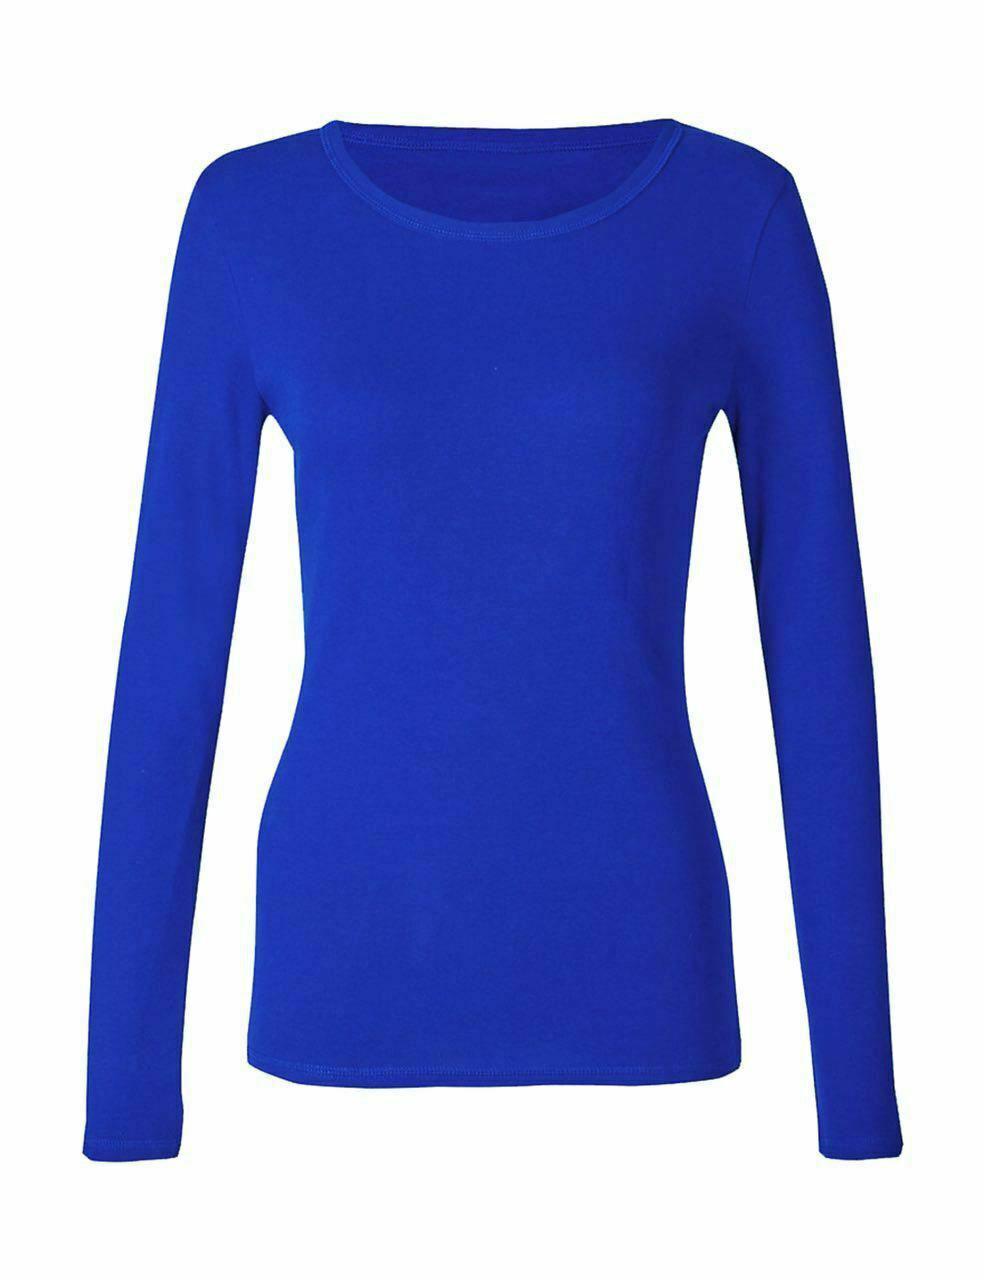 Ladies Plain Royal Blue Long Sleeve Round Neck Stretch T-Shirt